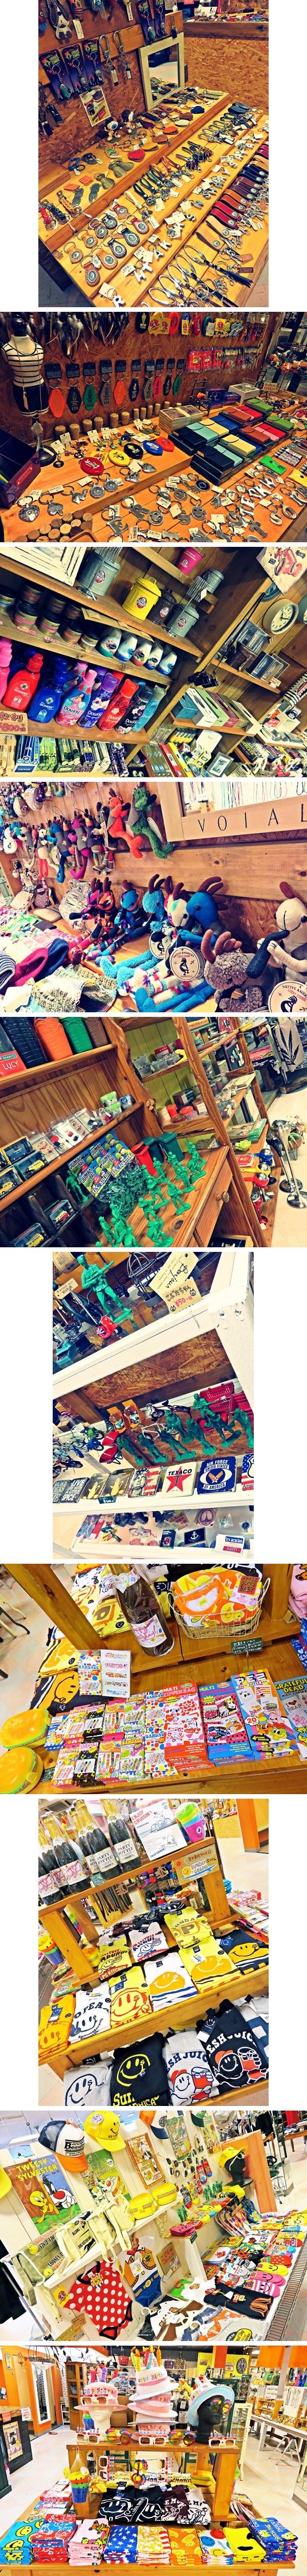 2015-09-18 25周年記念祭 店内 016 ブログ用-vert 雑貨 2